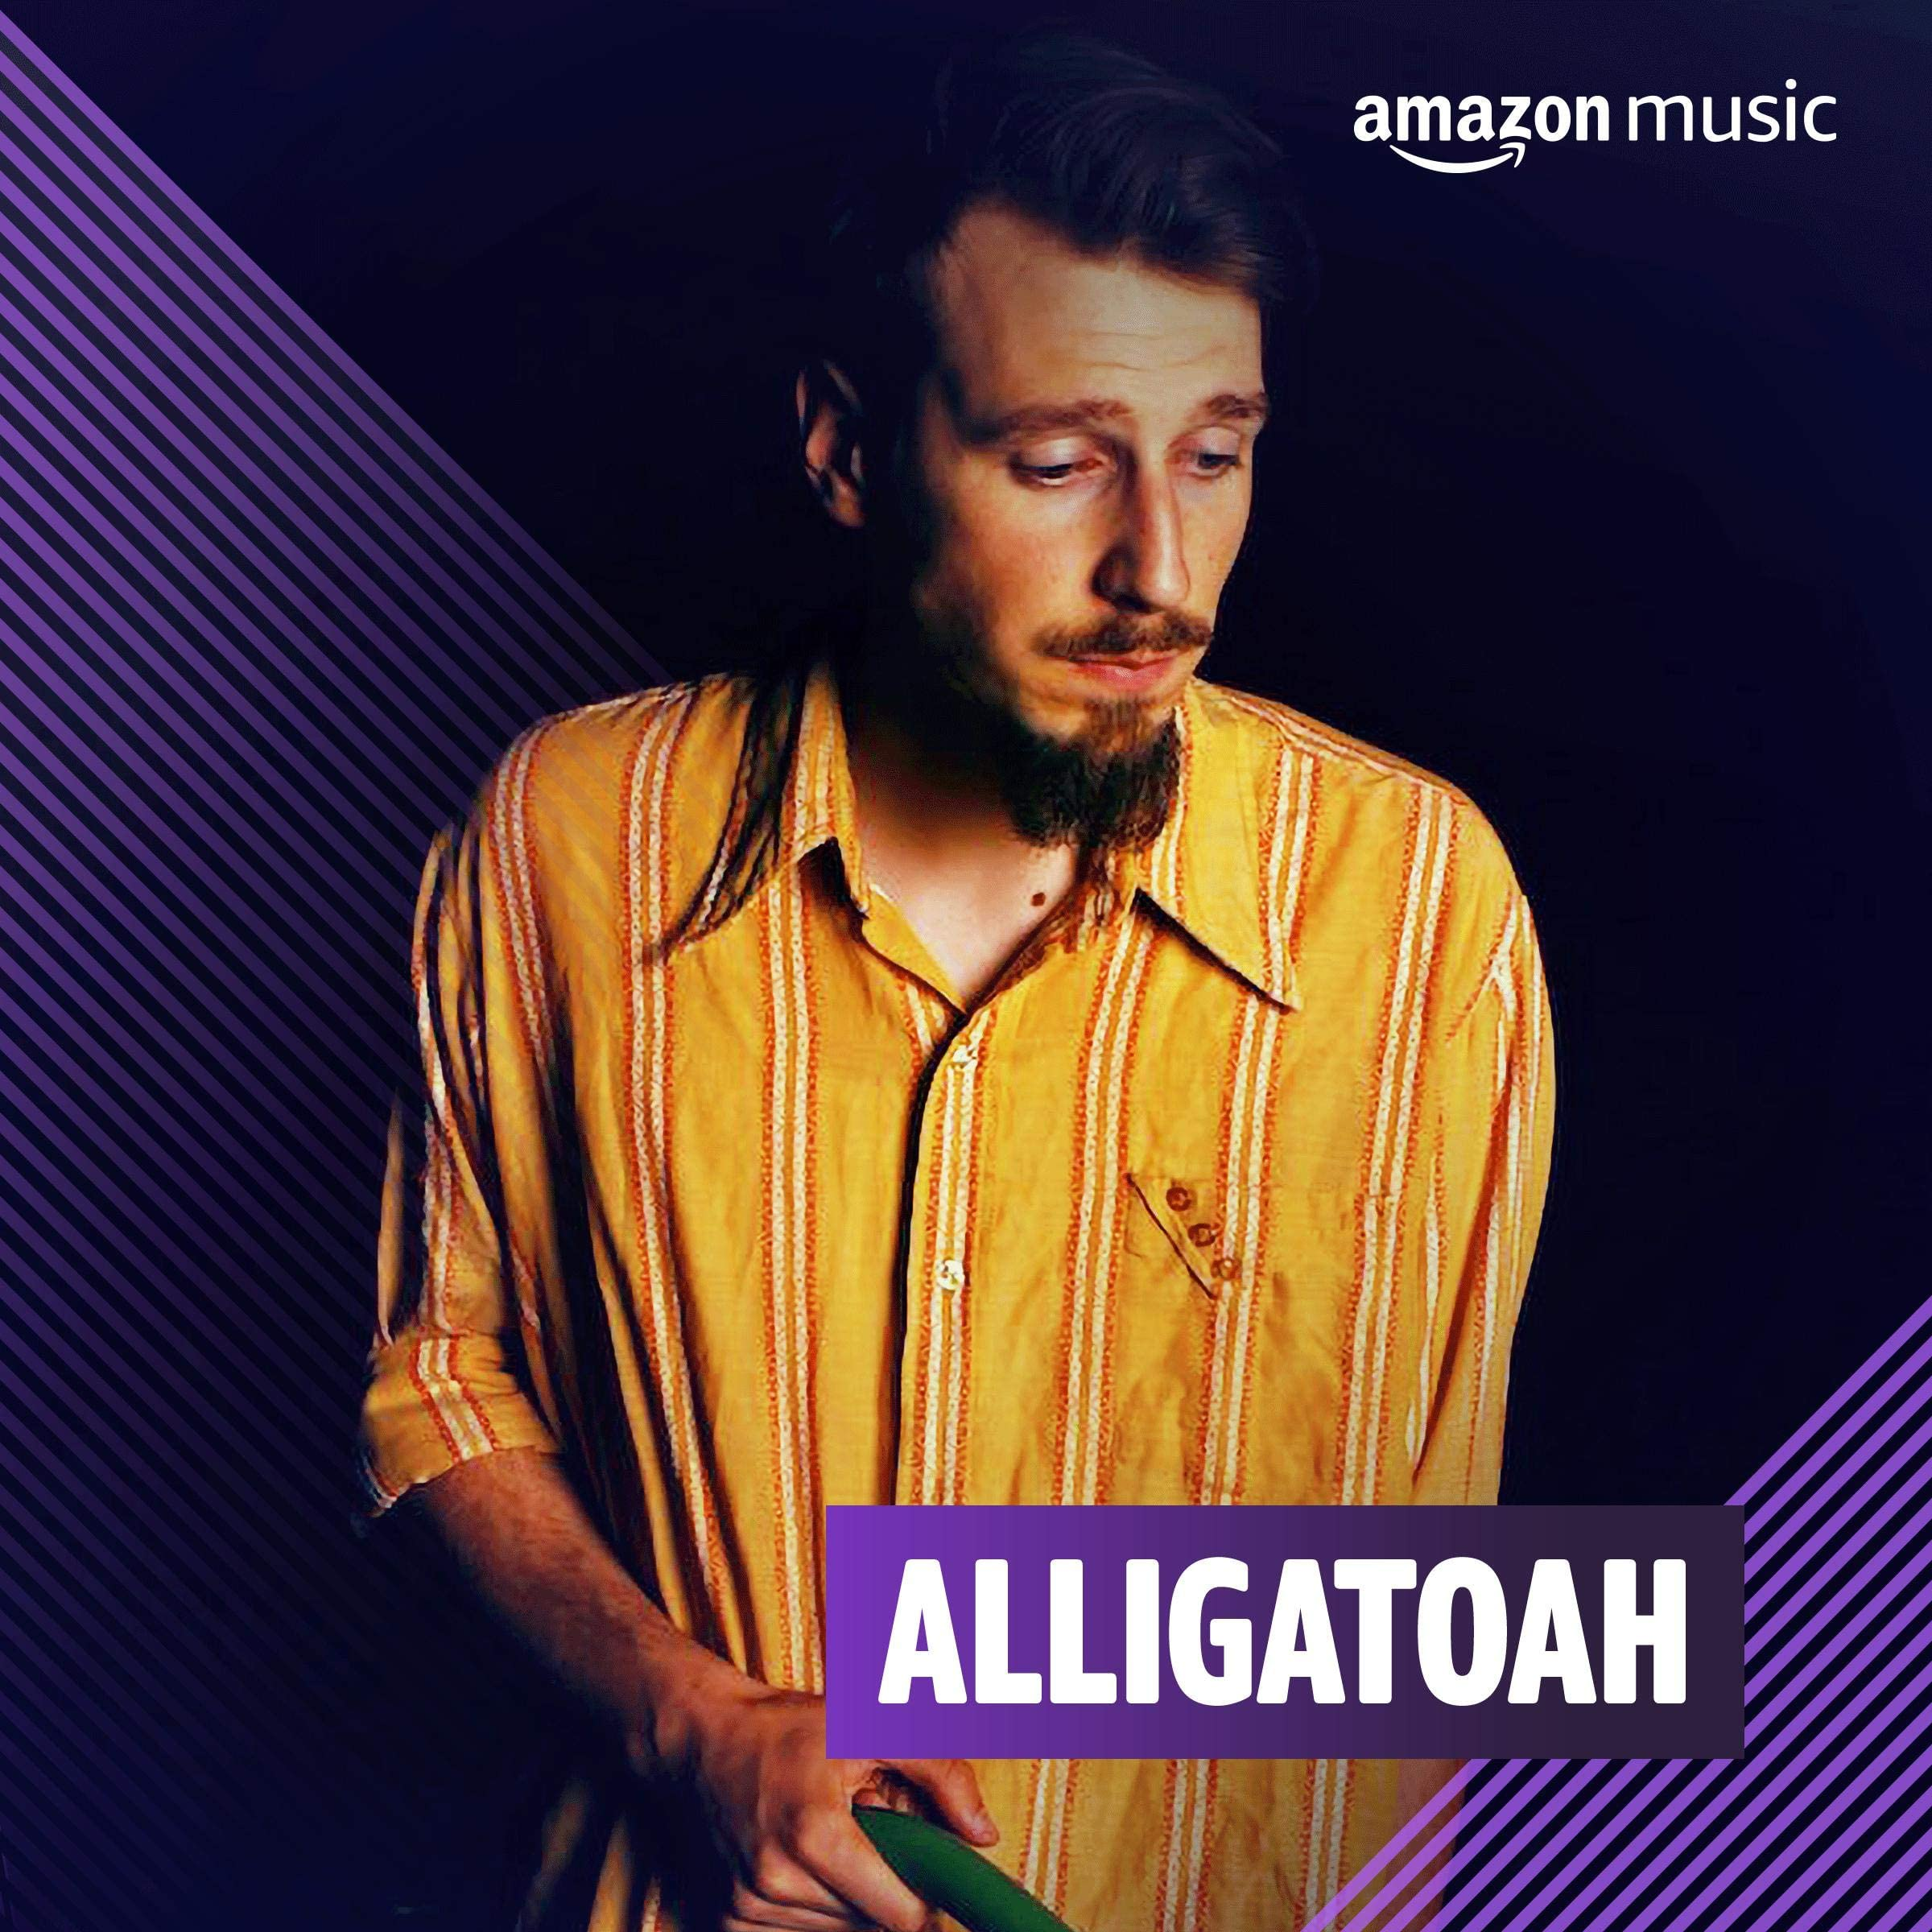 Alligatoah